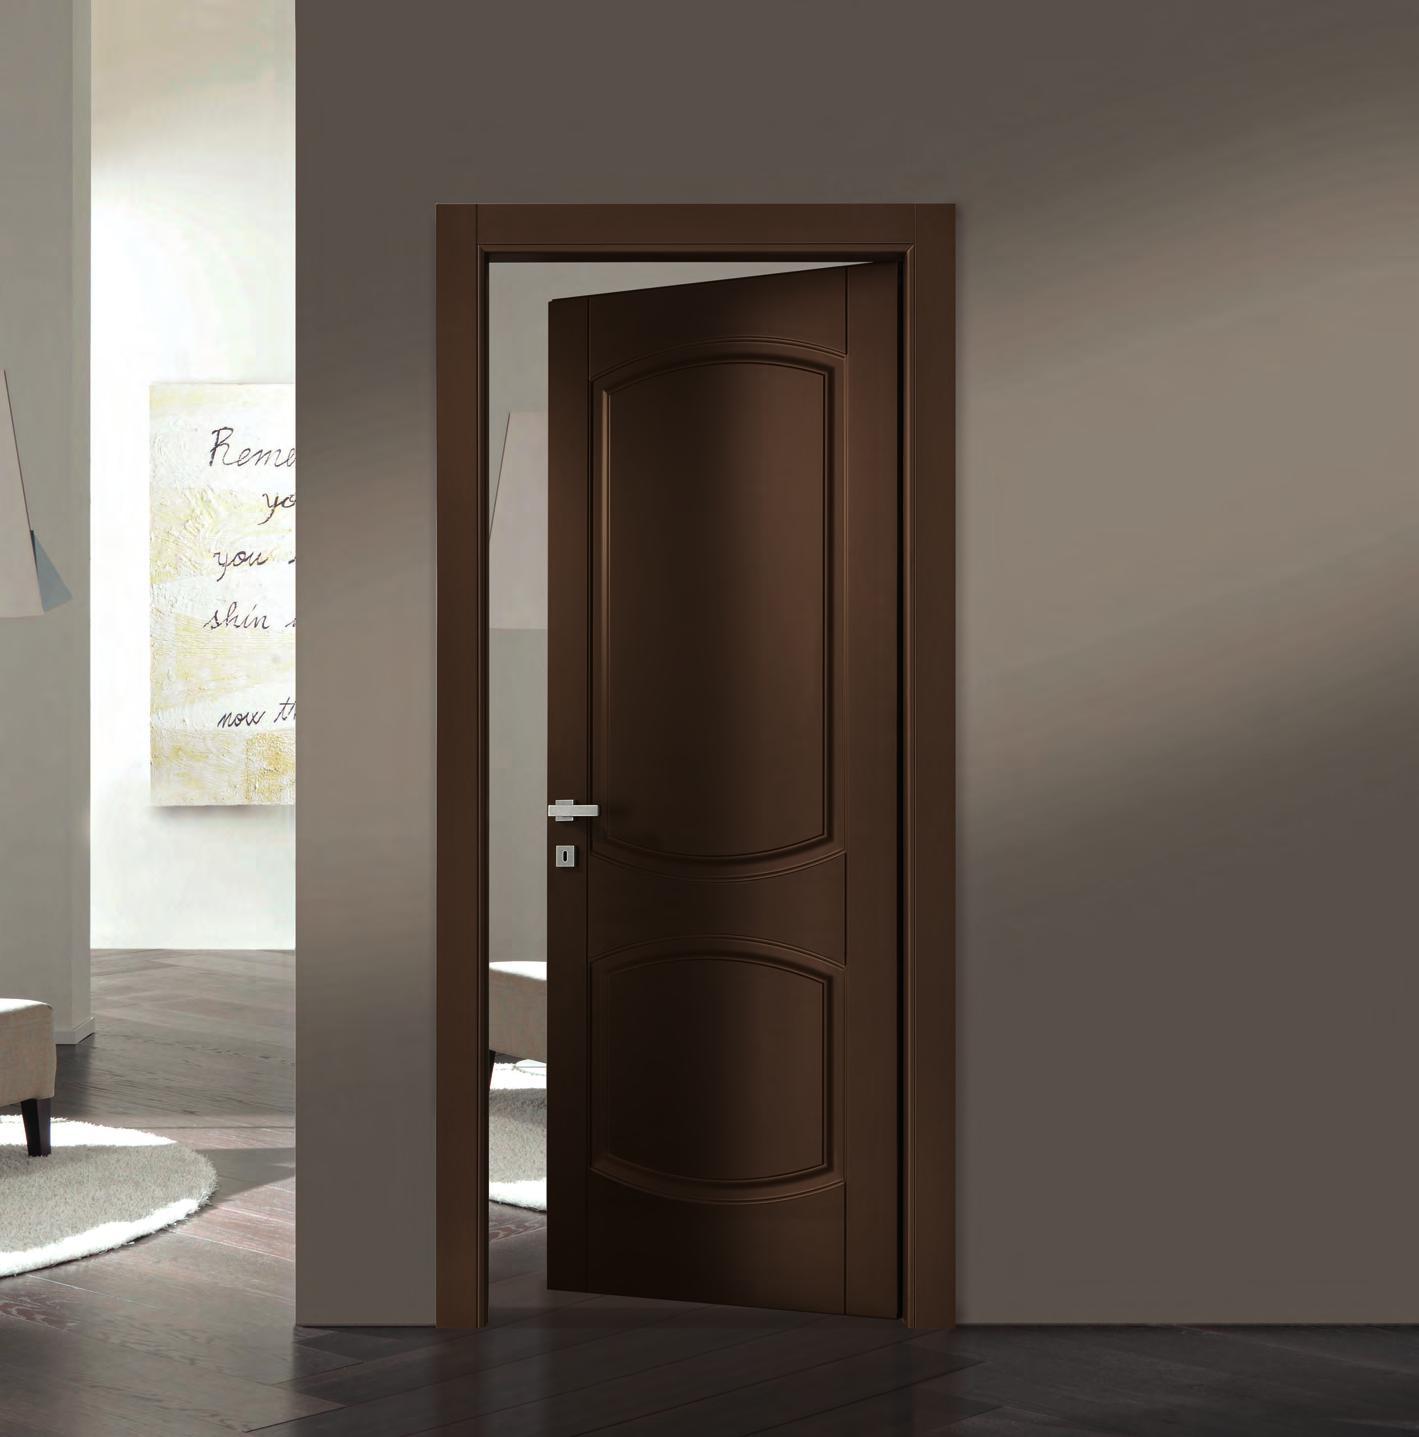 Bertolotto porte venezia maison du charme for Vendita arredamento